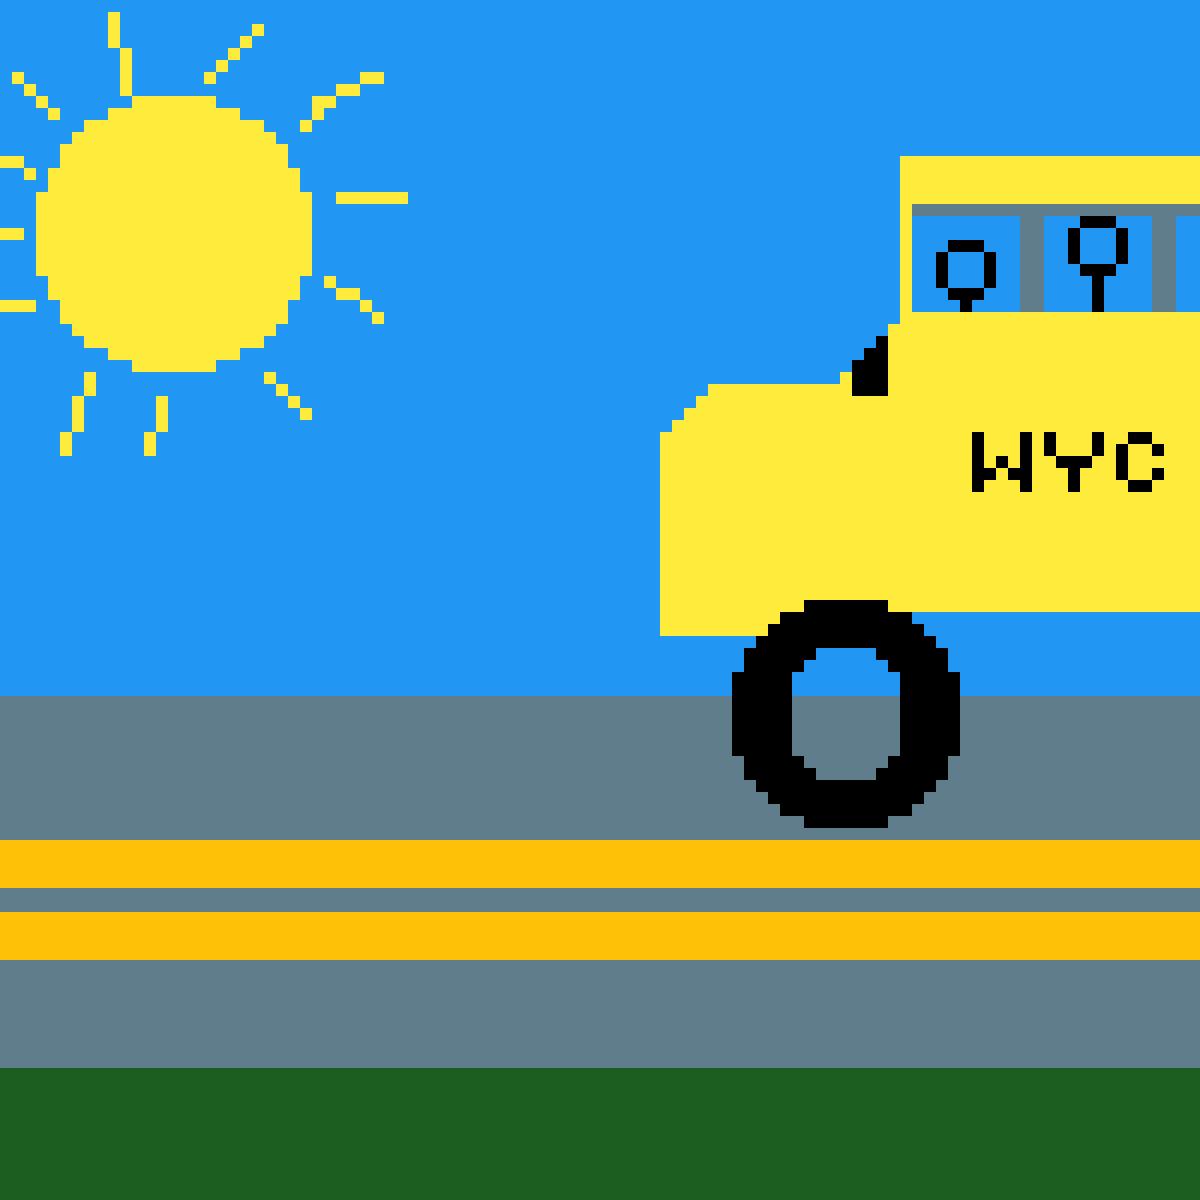 School Bus by Dogsandfrogs